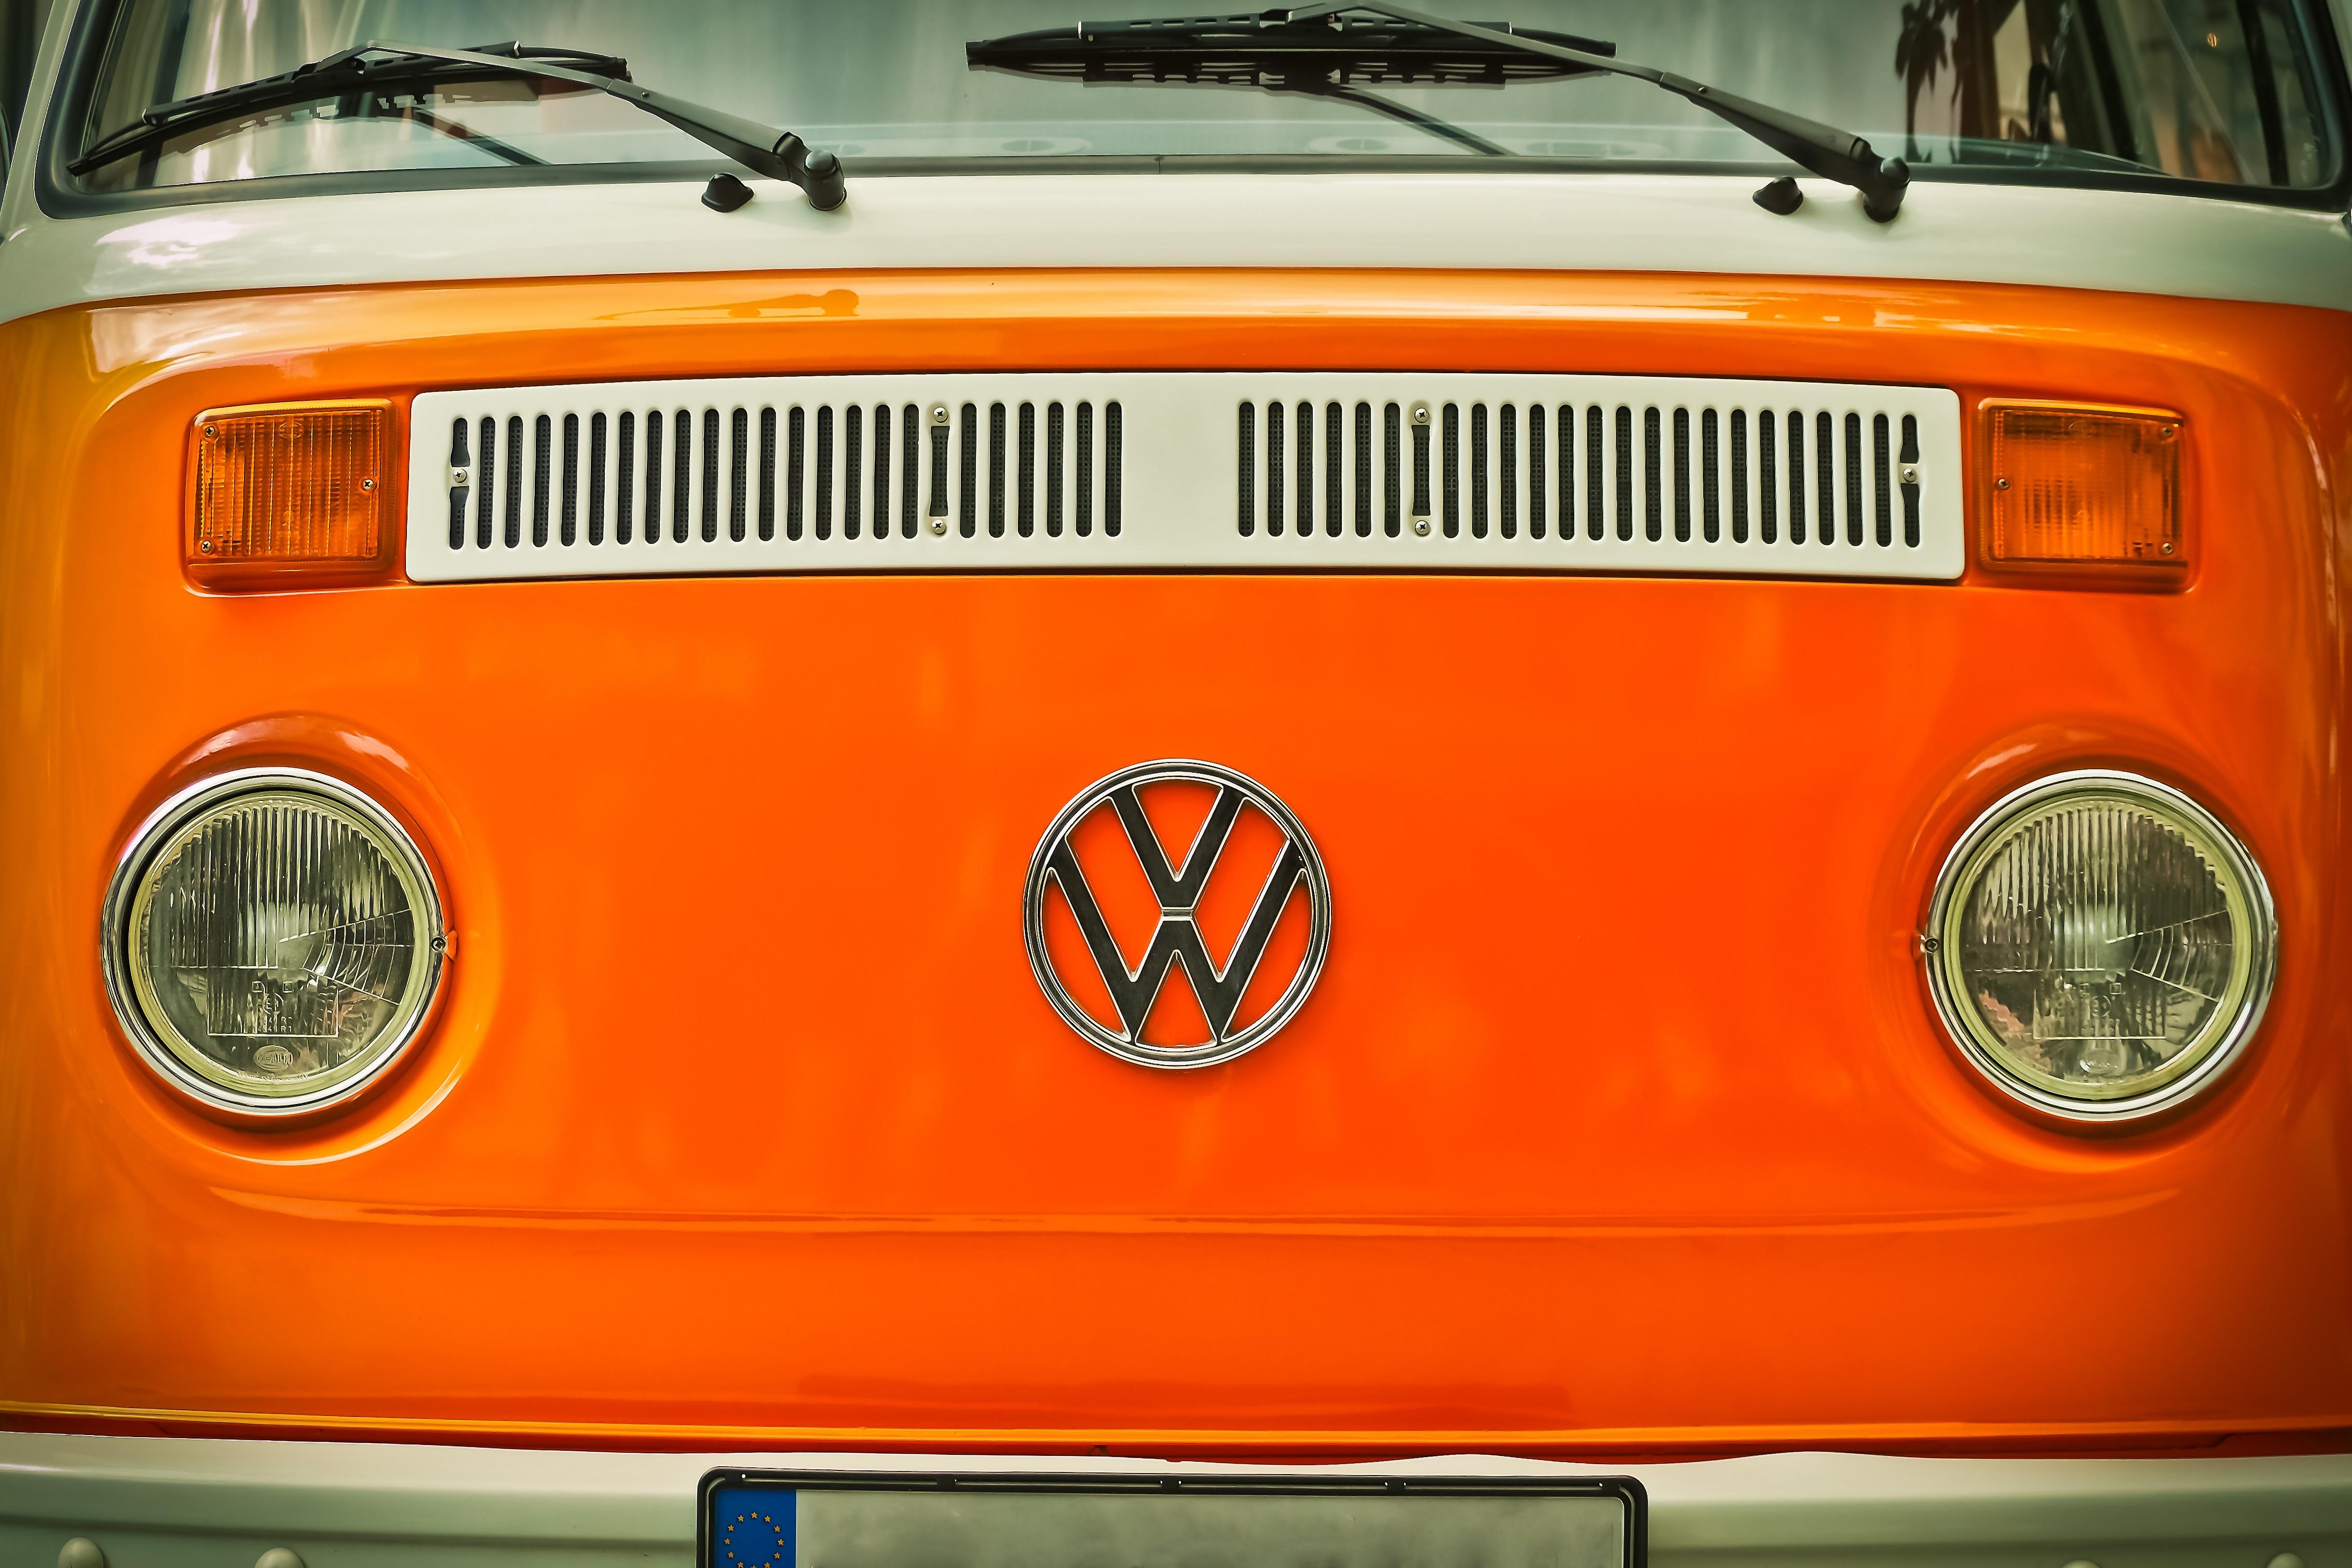 Free Images : vintage, retro, van, old, orange, auto, vw bus ...